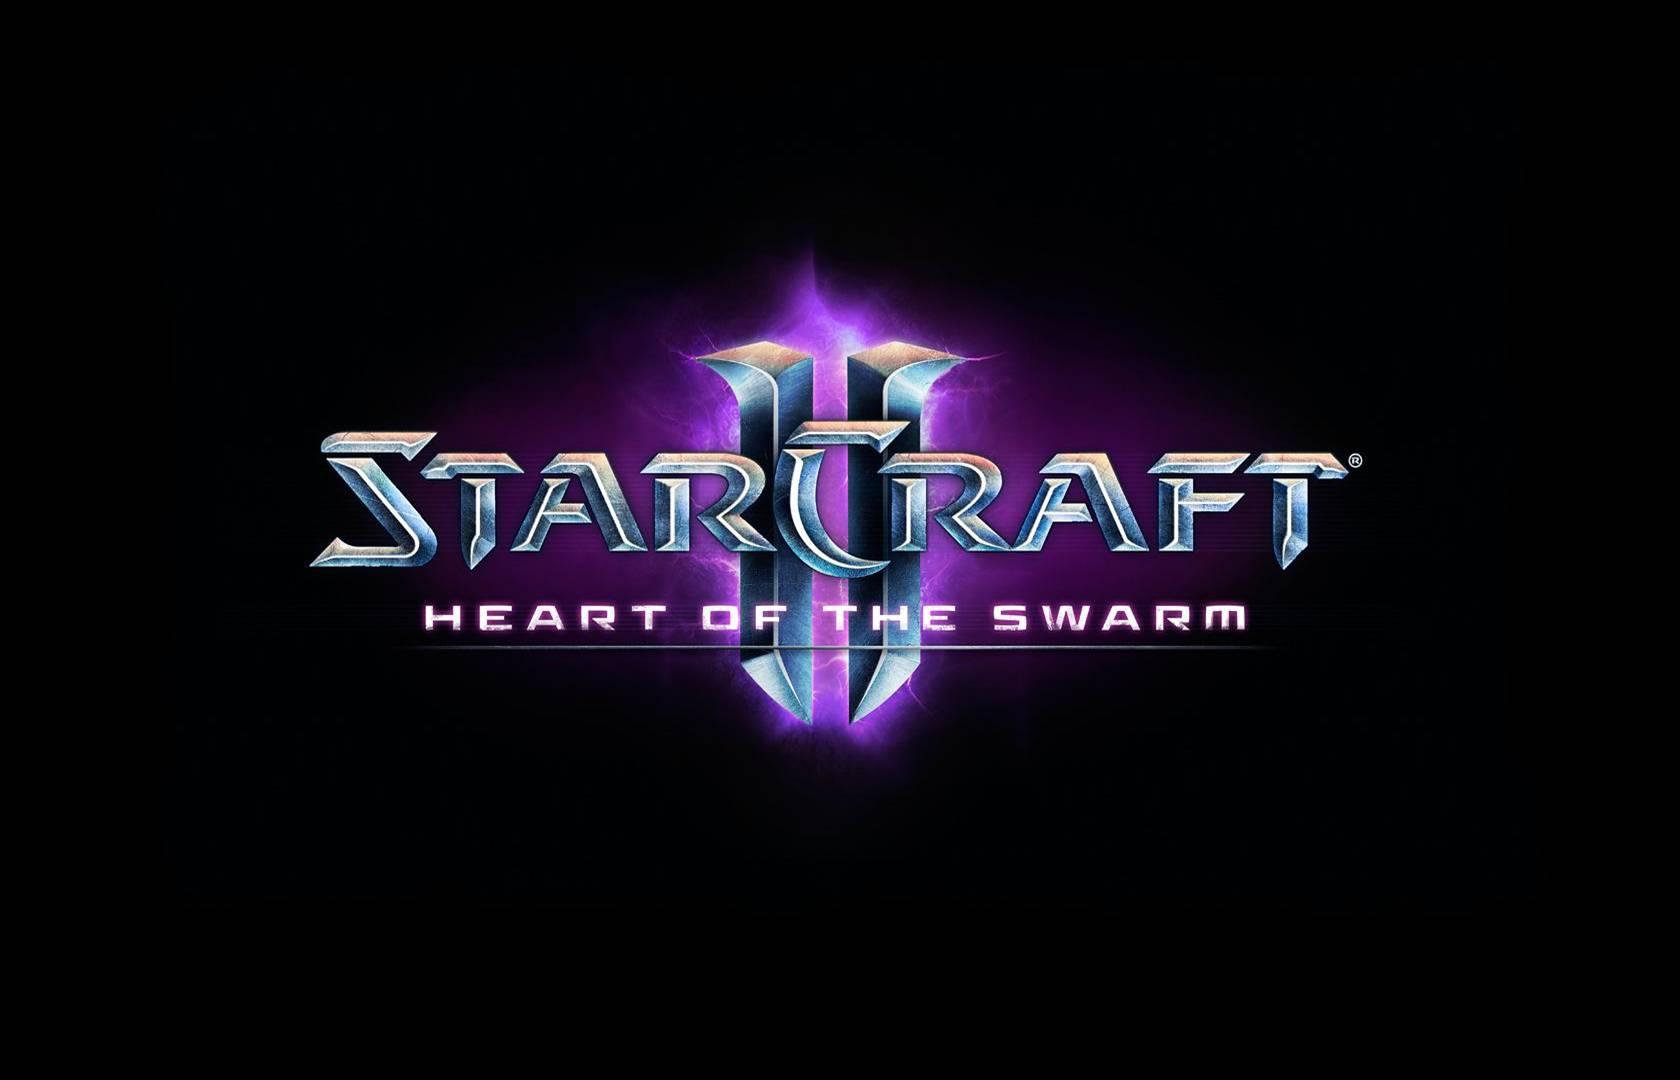 Starcraft 2 1080p Hd Wallpaper